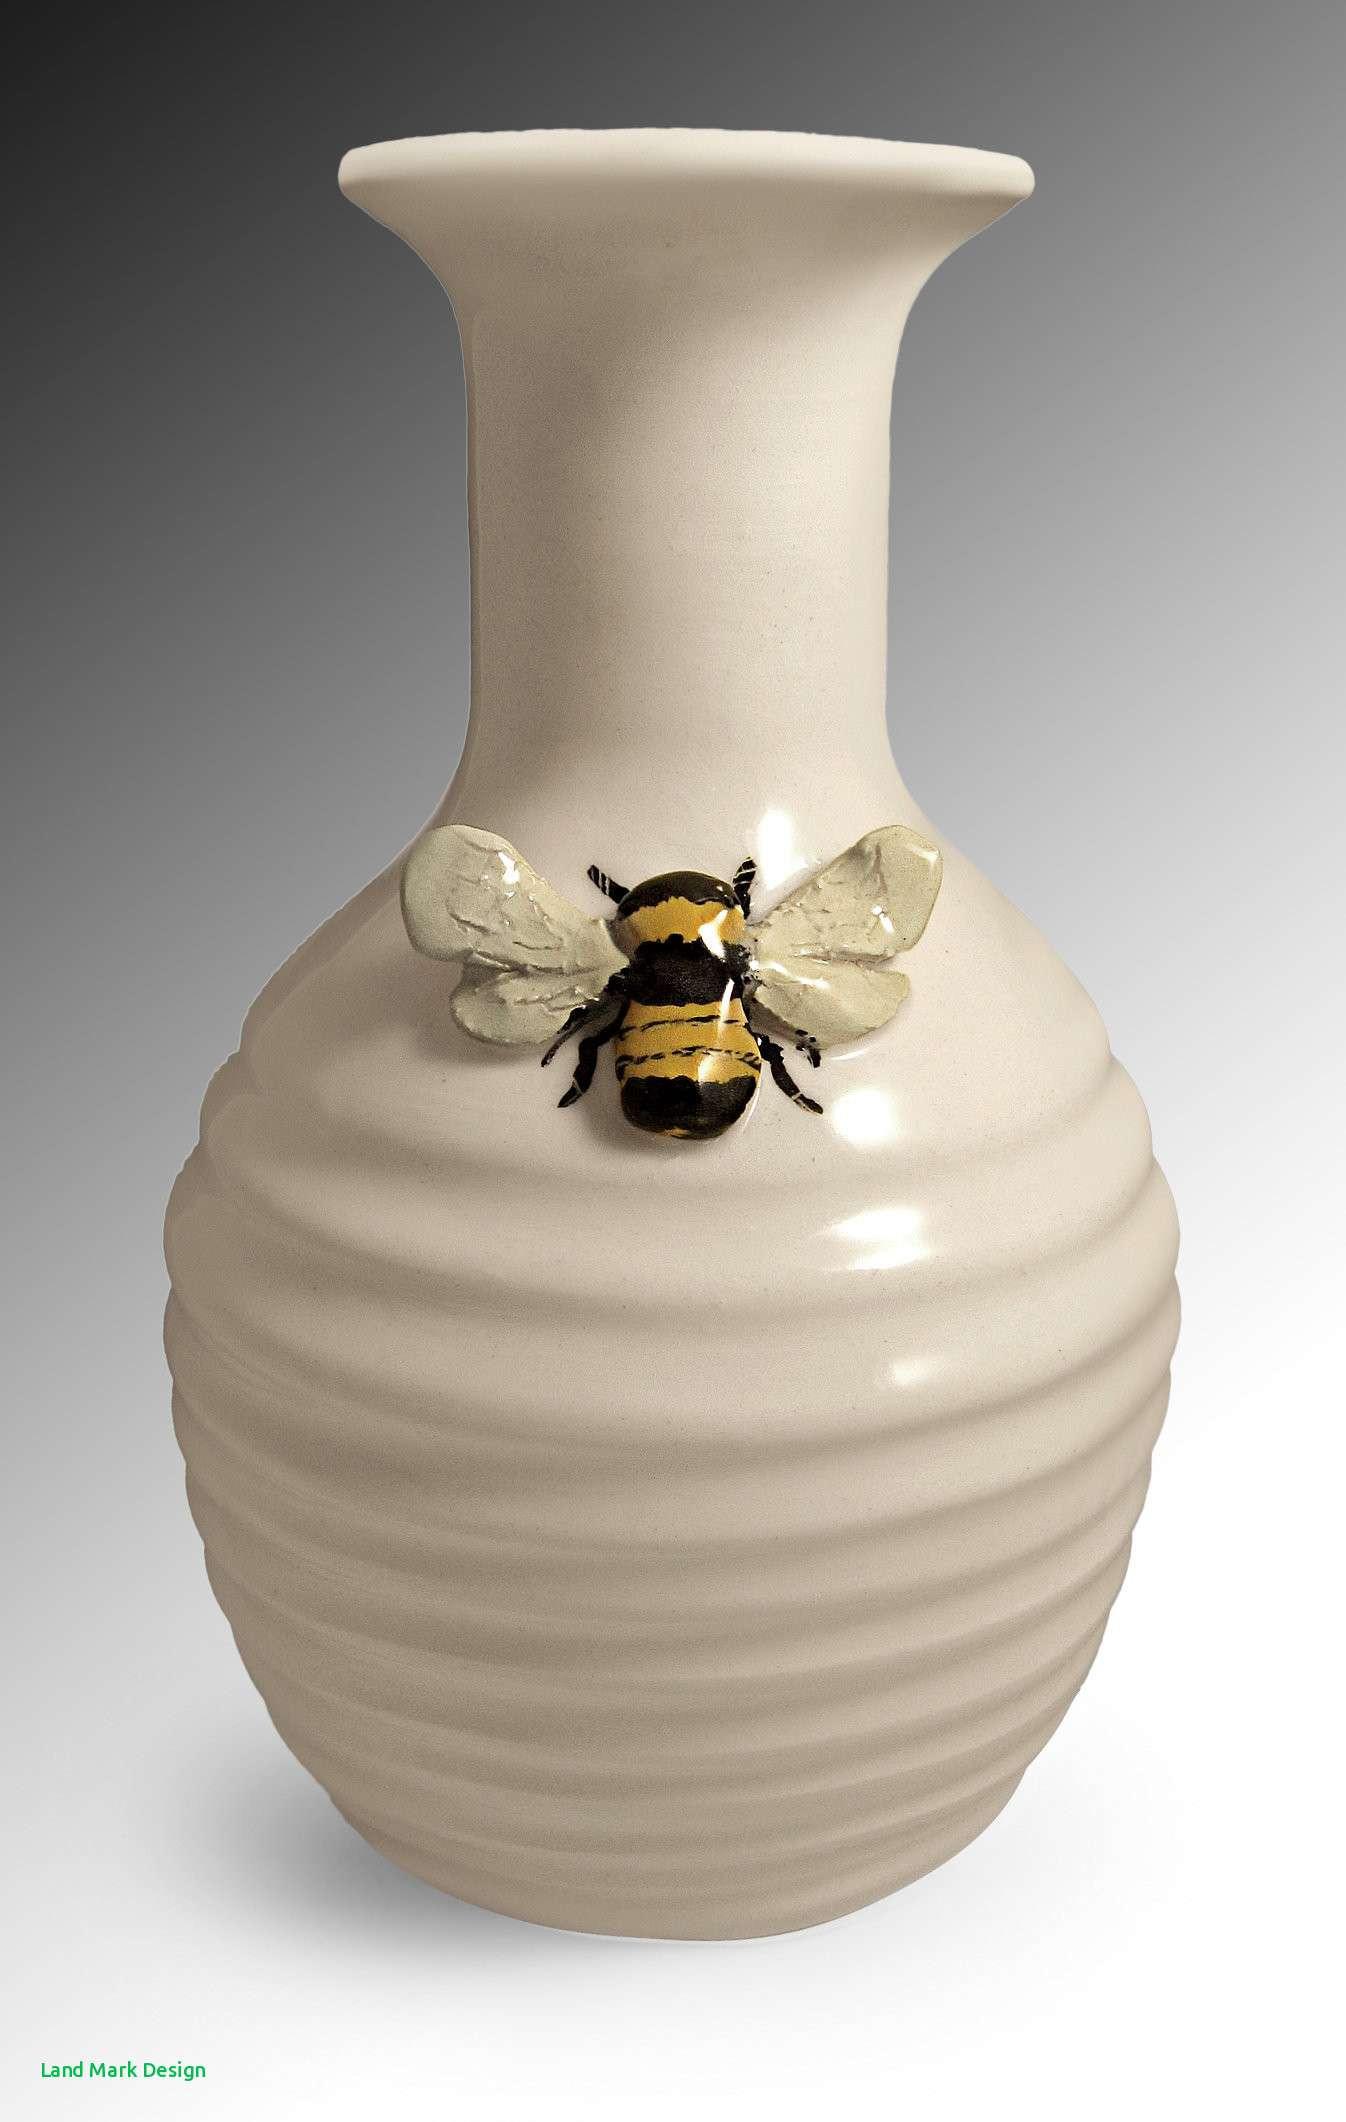 27 attractive Pottery Vase Designs